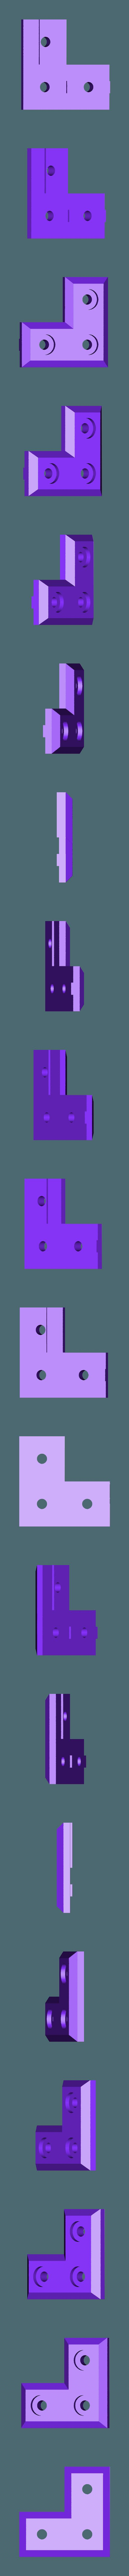 2020_Corner_Plate_3Screw_V2.stl Download free STL file 2020 Profile Aluminum 3D Printable Erector Set • 3D printer model, adamjvr